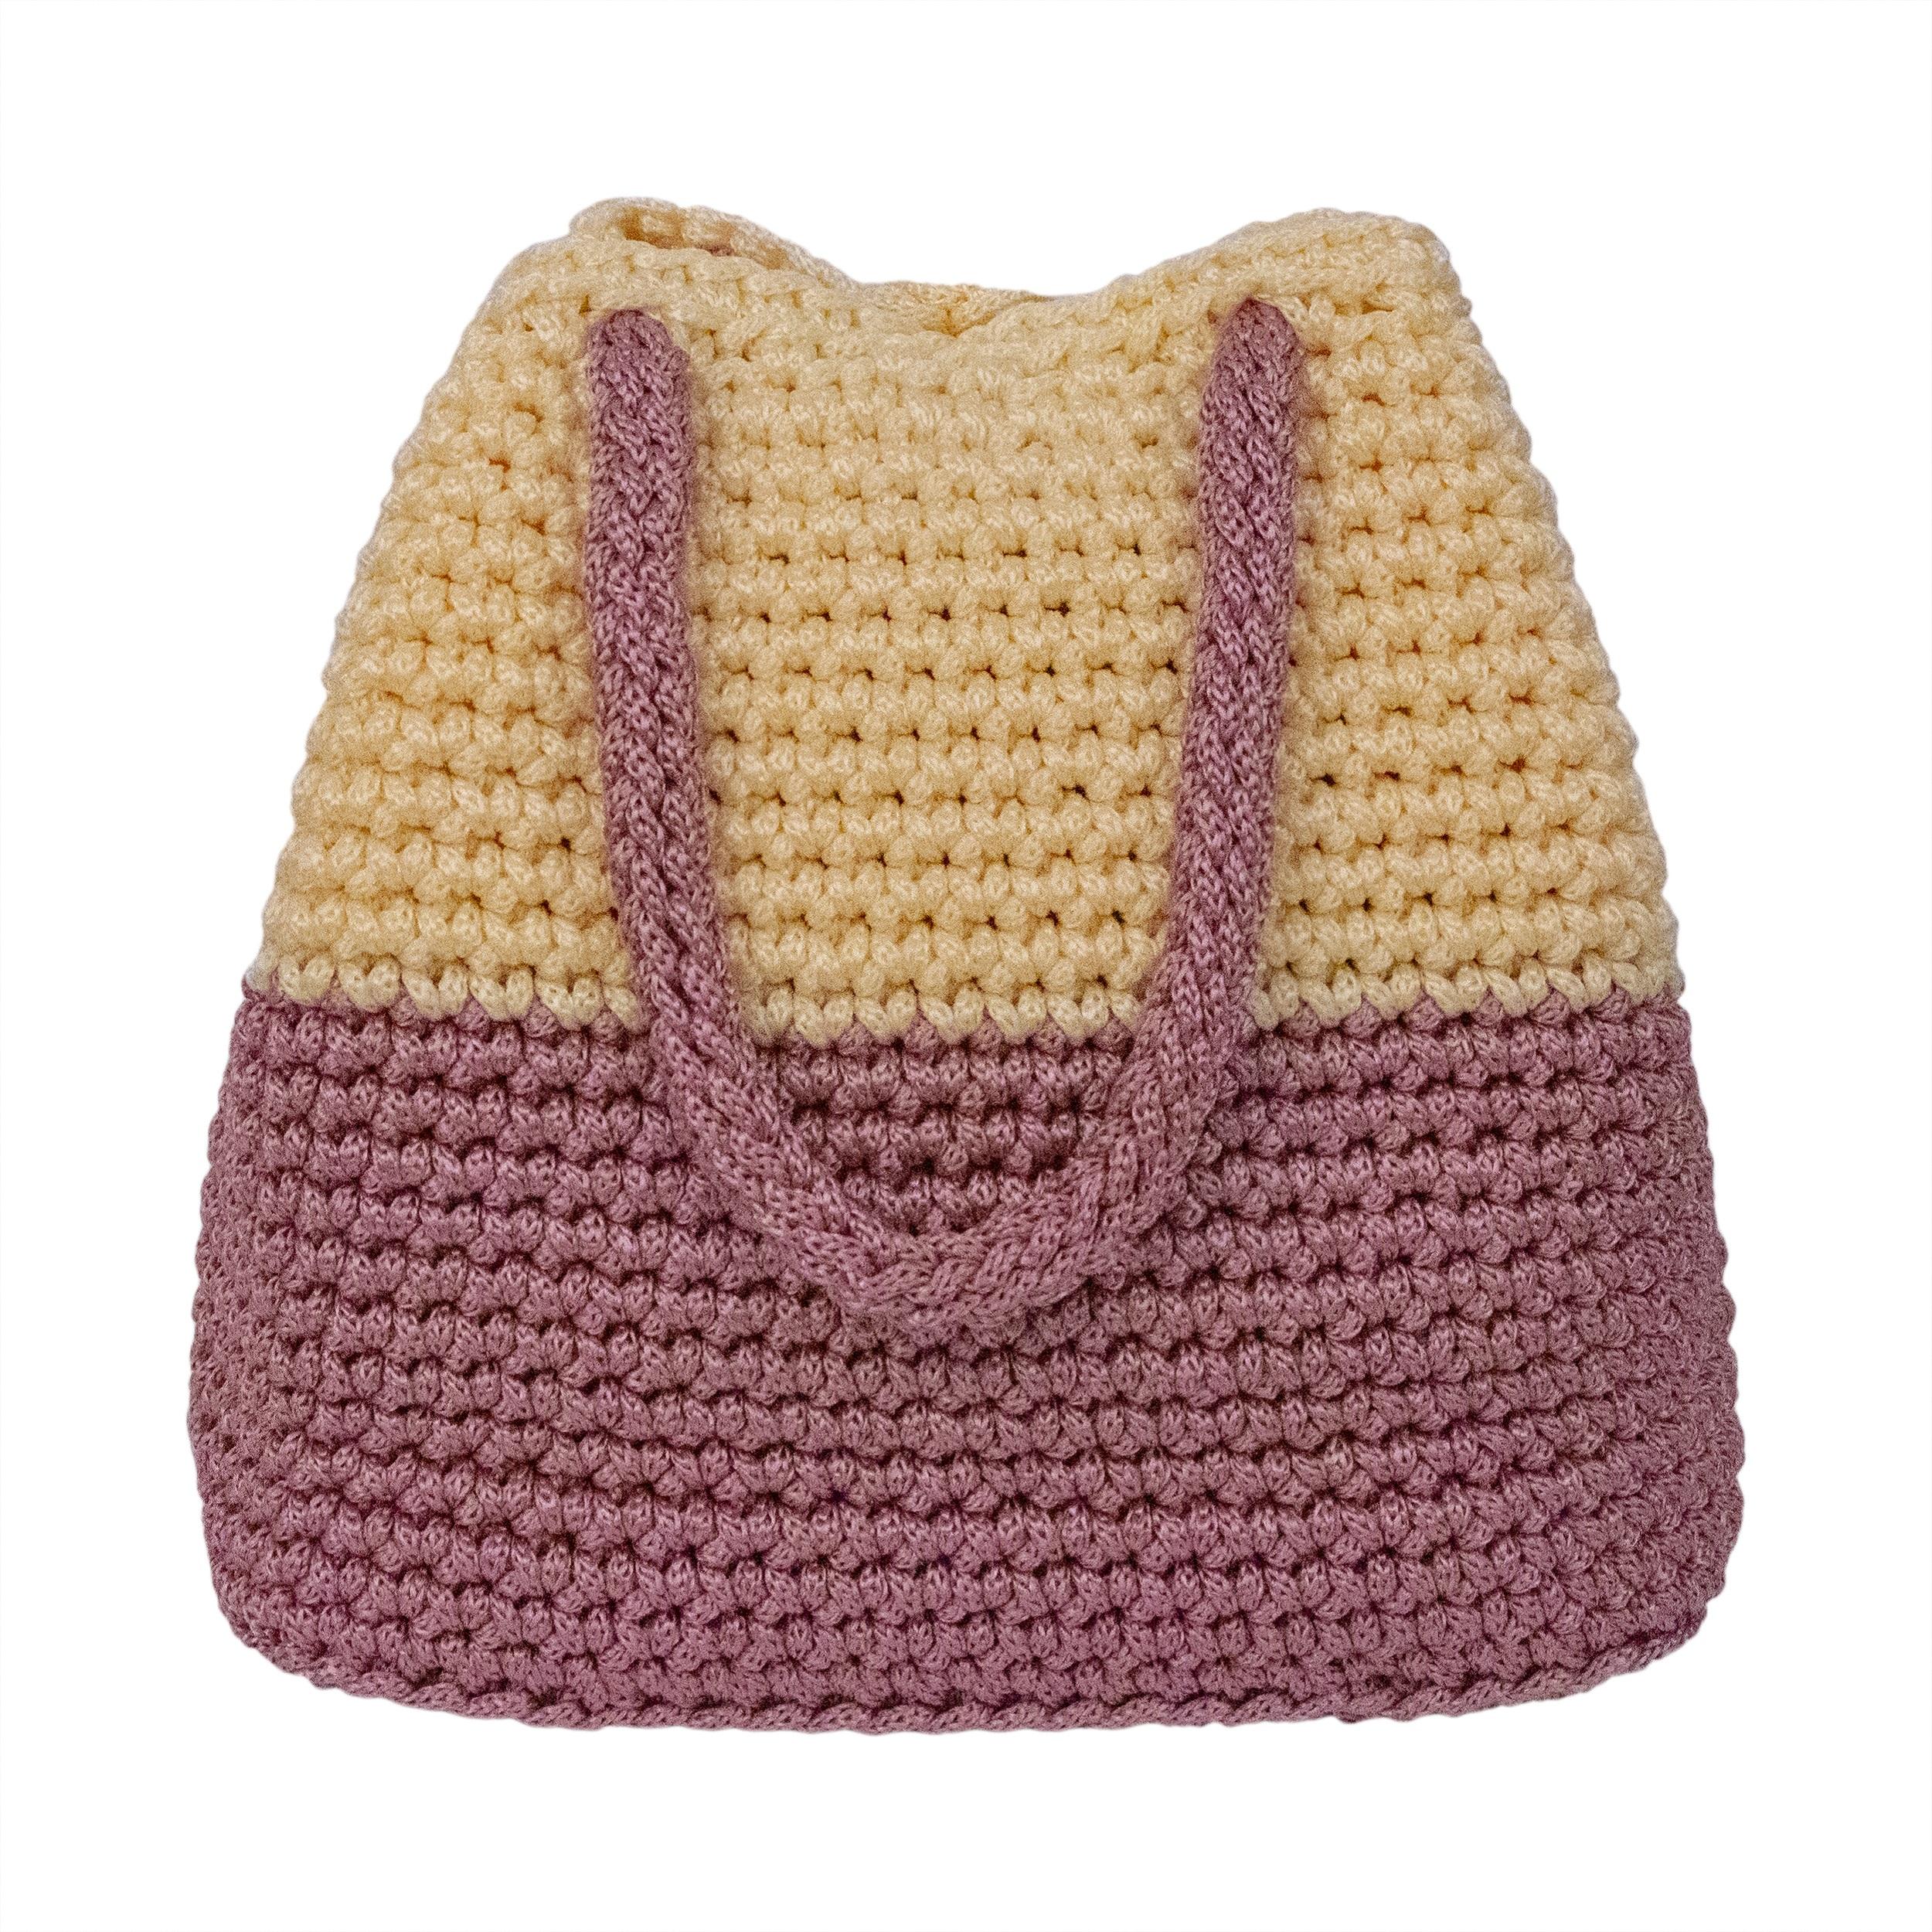 خرید                      کیف بافتنی کد so0ke